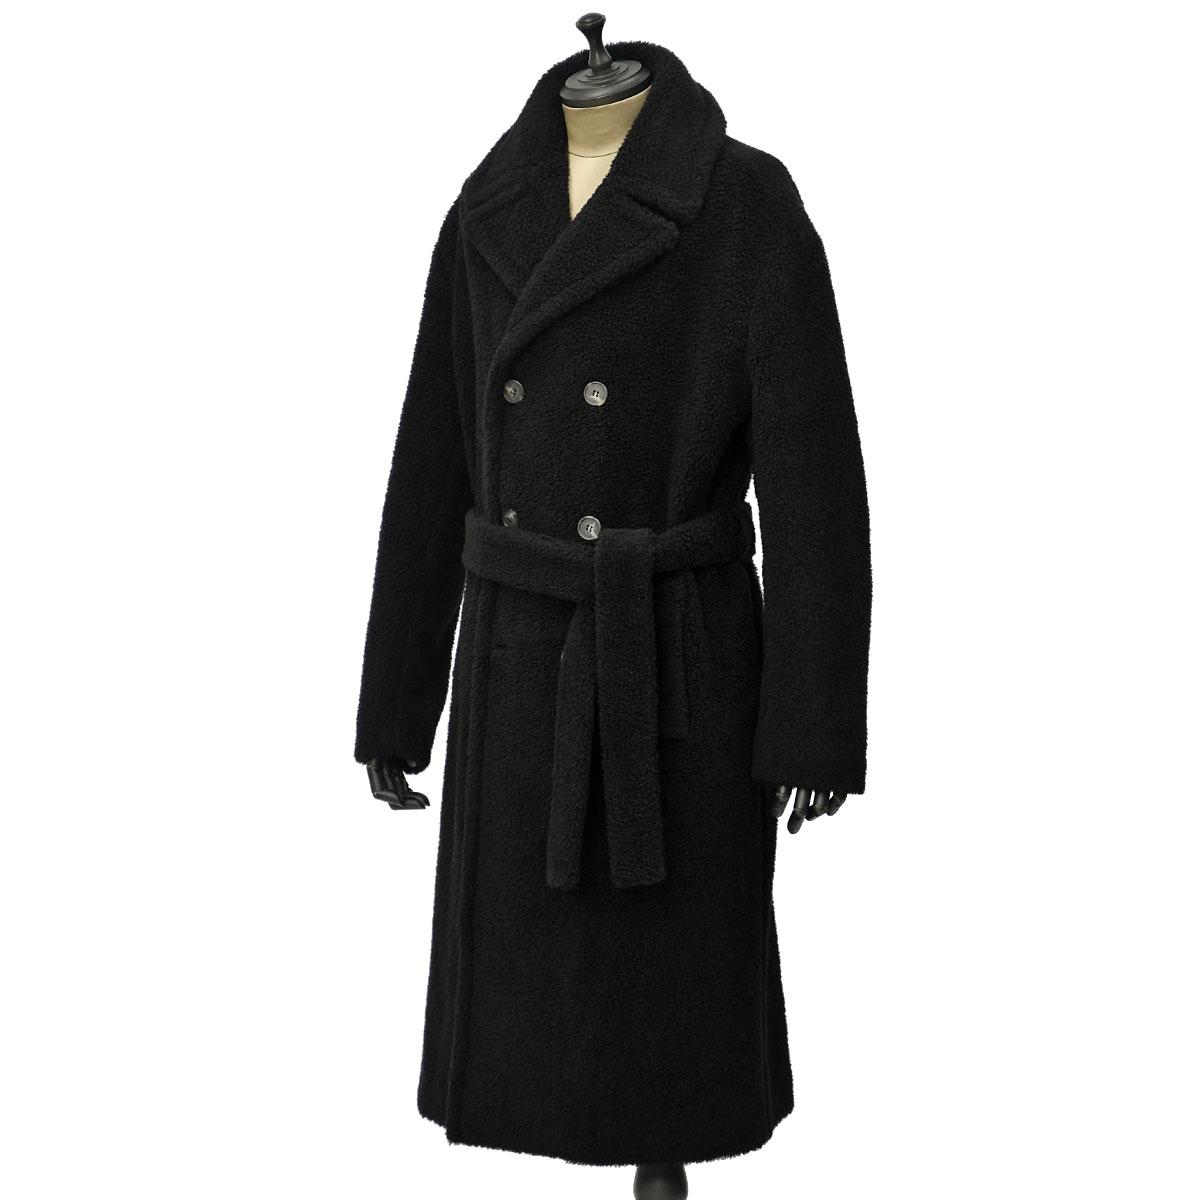 Solleciti【ソレシティ】ベルテッドコート DOUBLE MAN COAT CSM0C80222709000 BLACK キャメル シルク ブラック